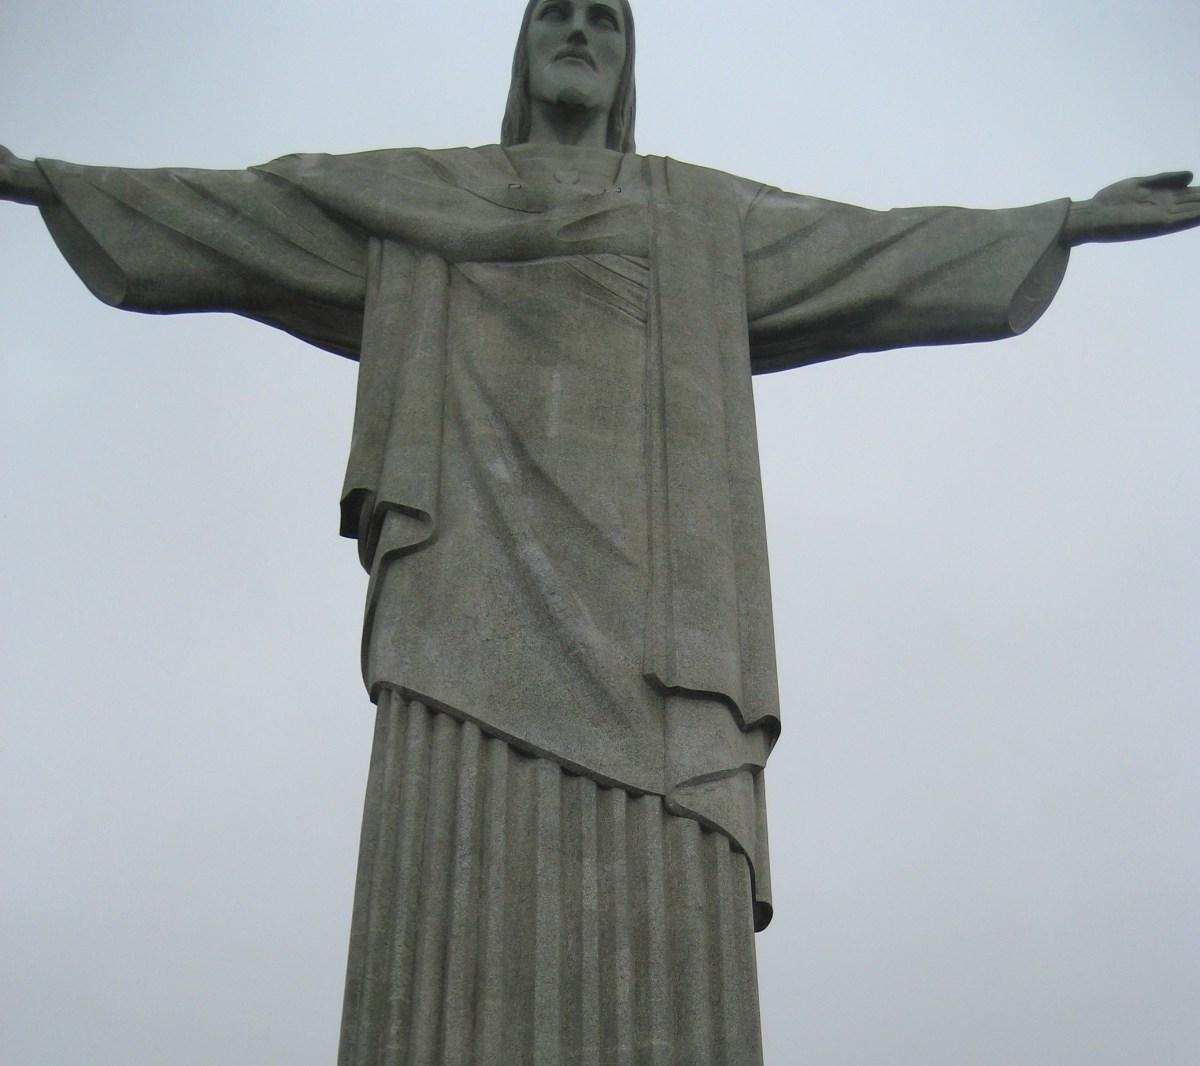 Christusstatue in Rio de Janeiro